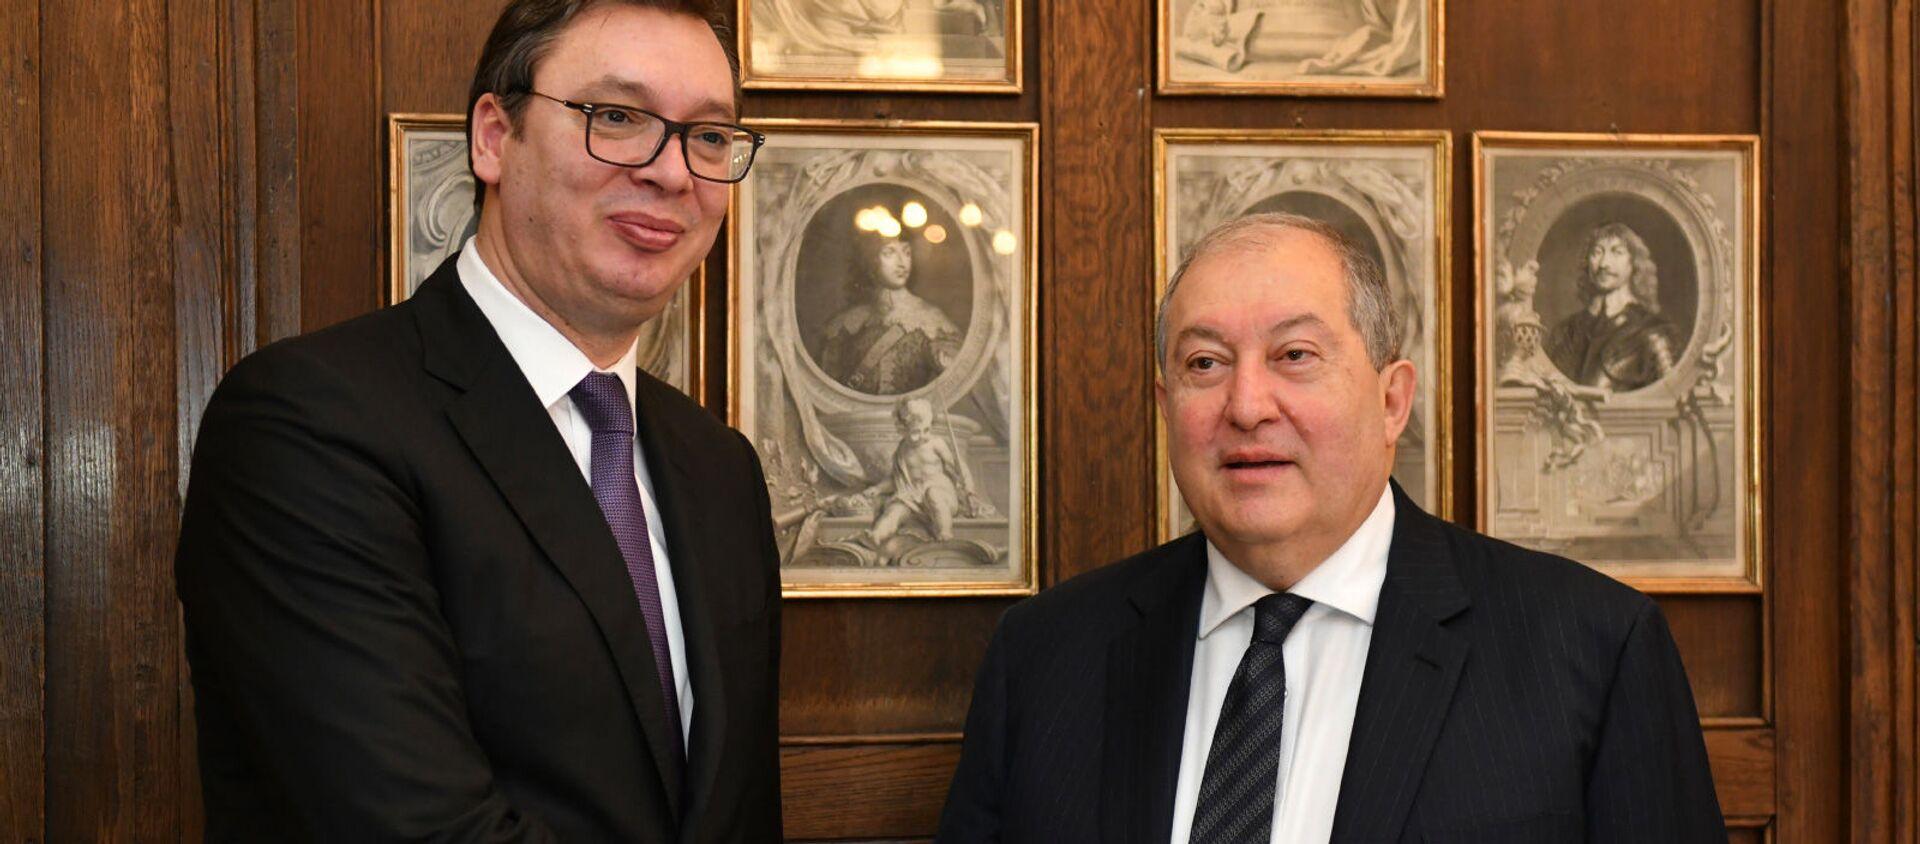 Встреча президента Армена Саркисяна  с президентом Сербии Александром Вучичем в Мюнхене - Sputnik Армения, 1920, 29.07.2021